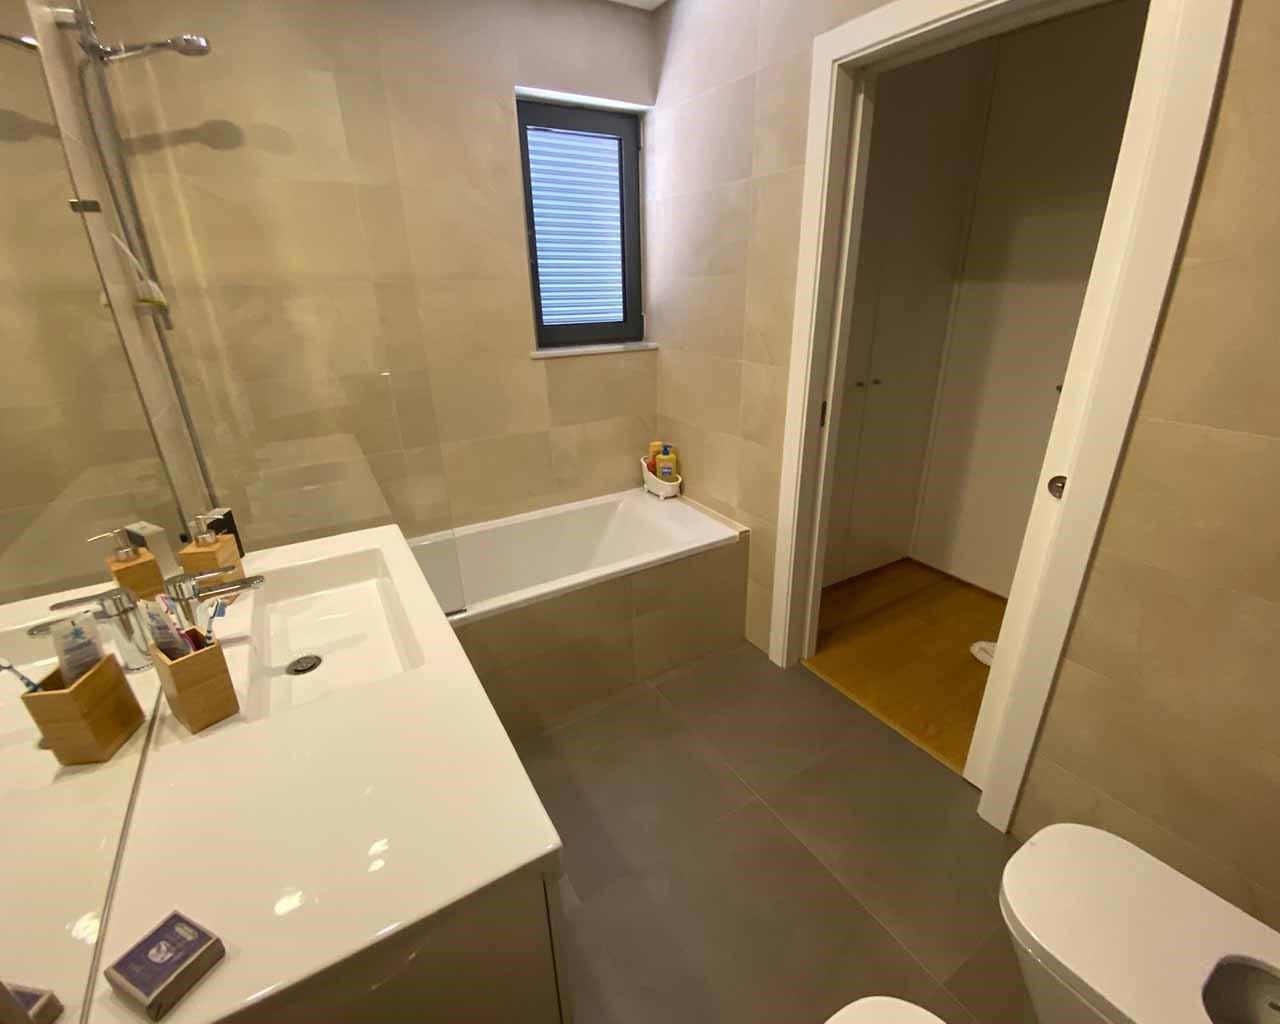 Lux_Terrace_17_2B - Salle de bain1